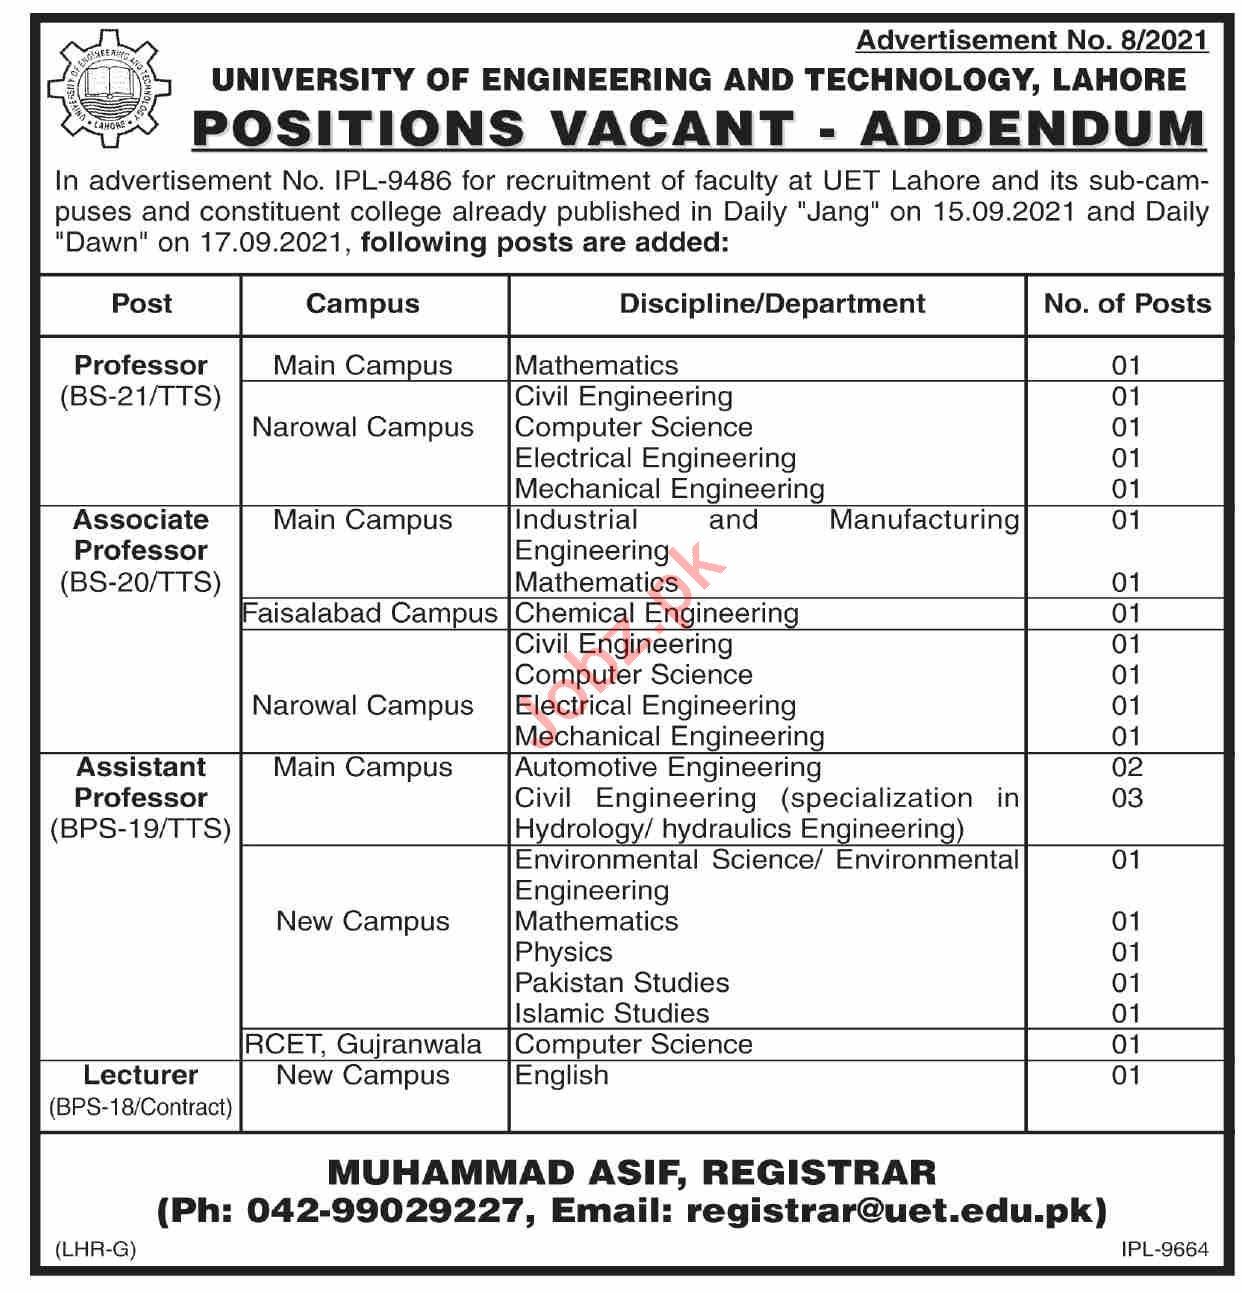 UET University Lahore Jobs 2021 for Professors